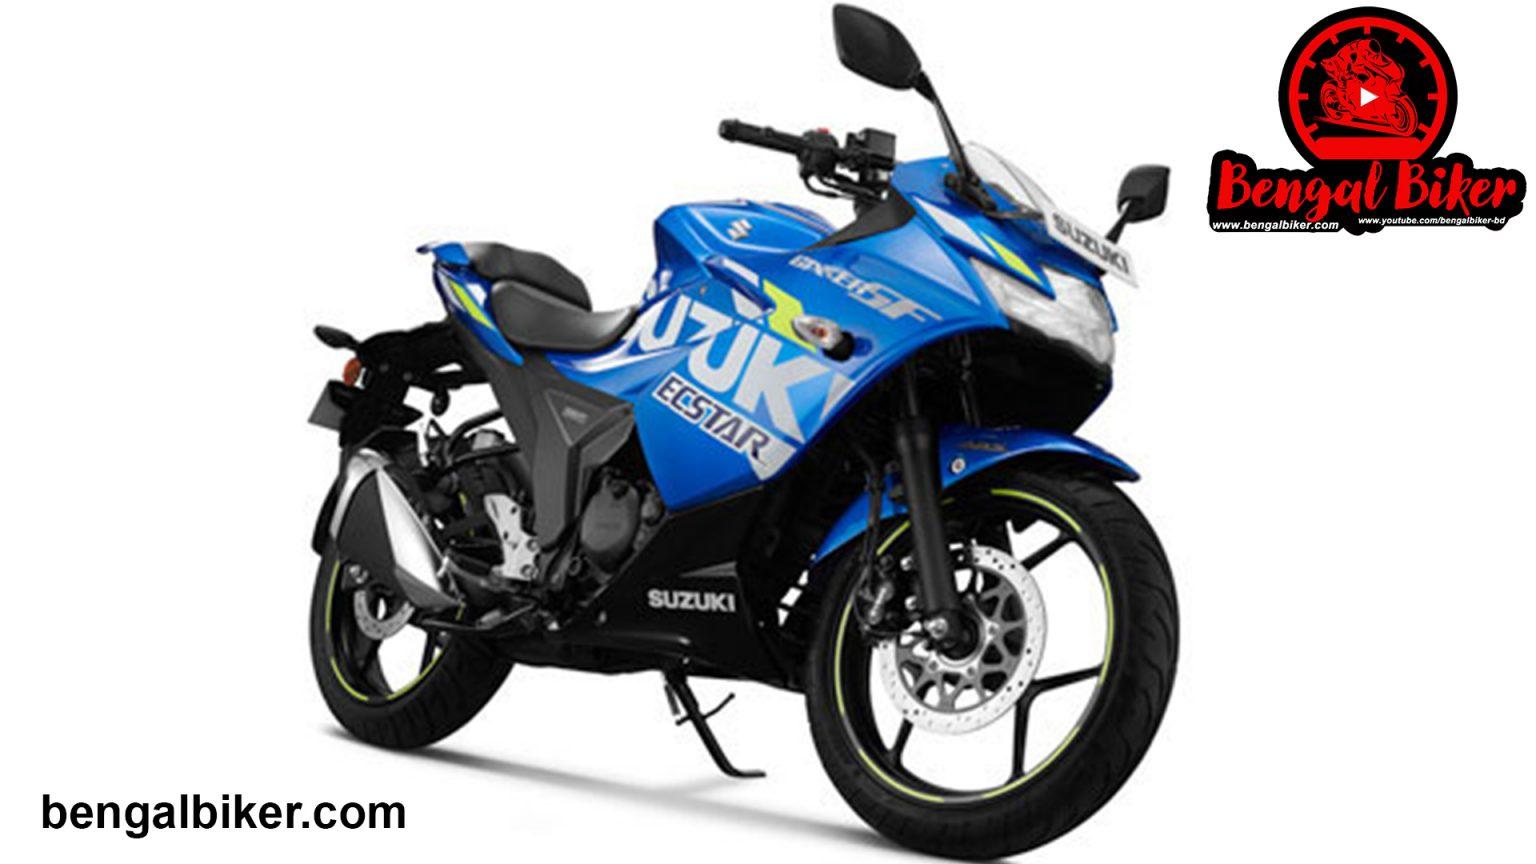 Suzuki Gixxer SF fi abs blue 1536x864 1